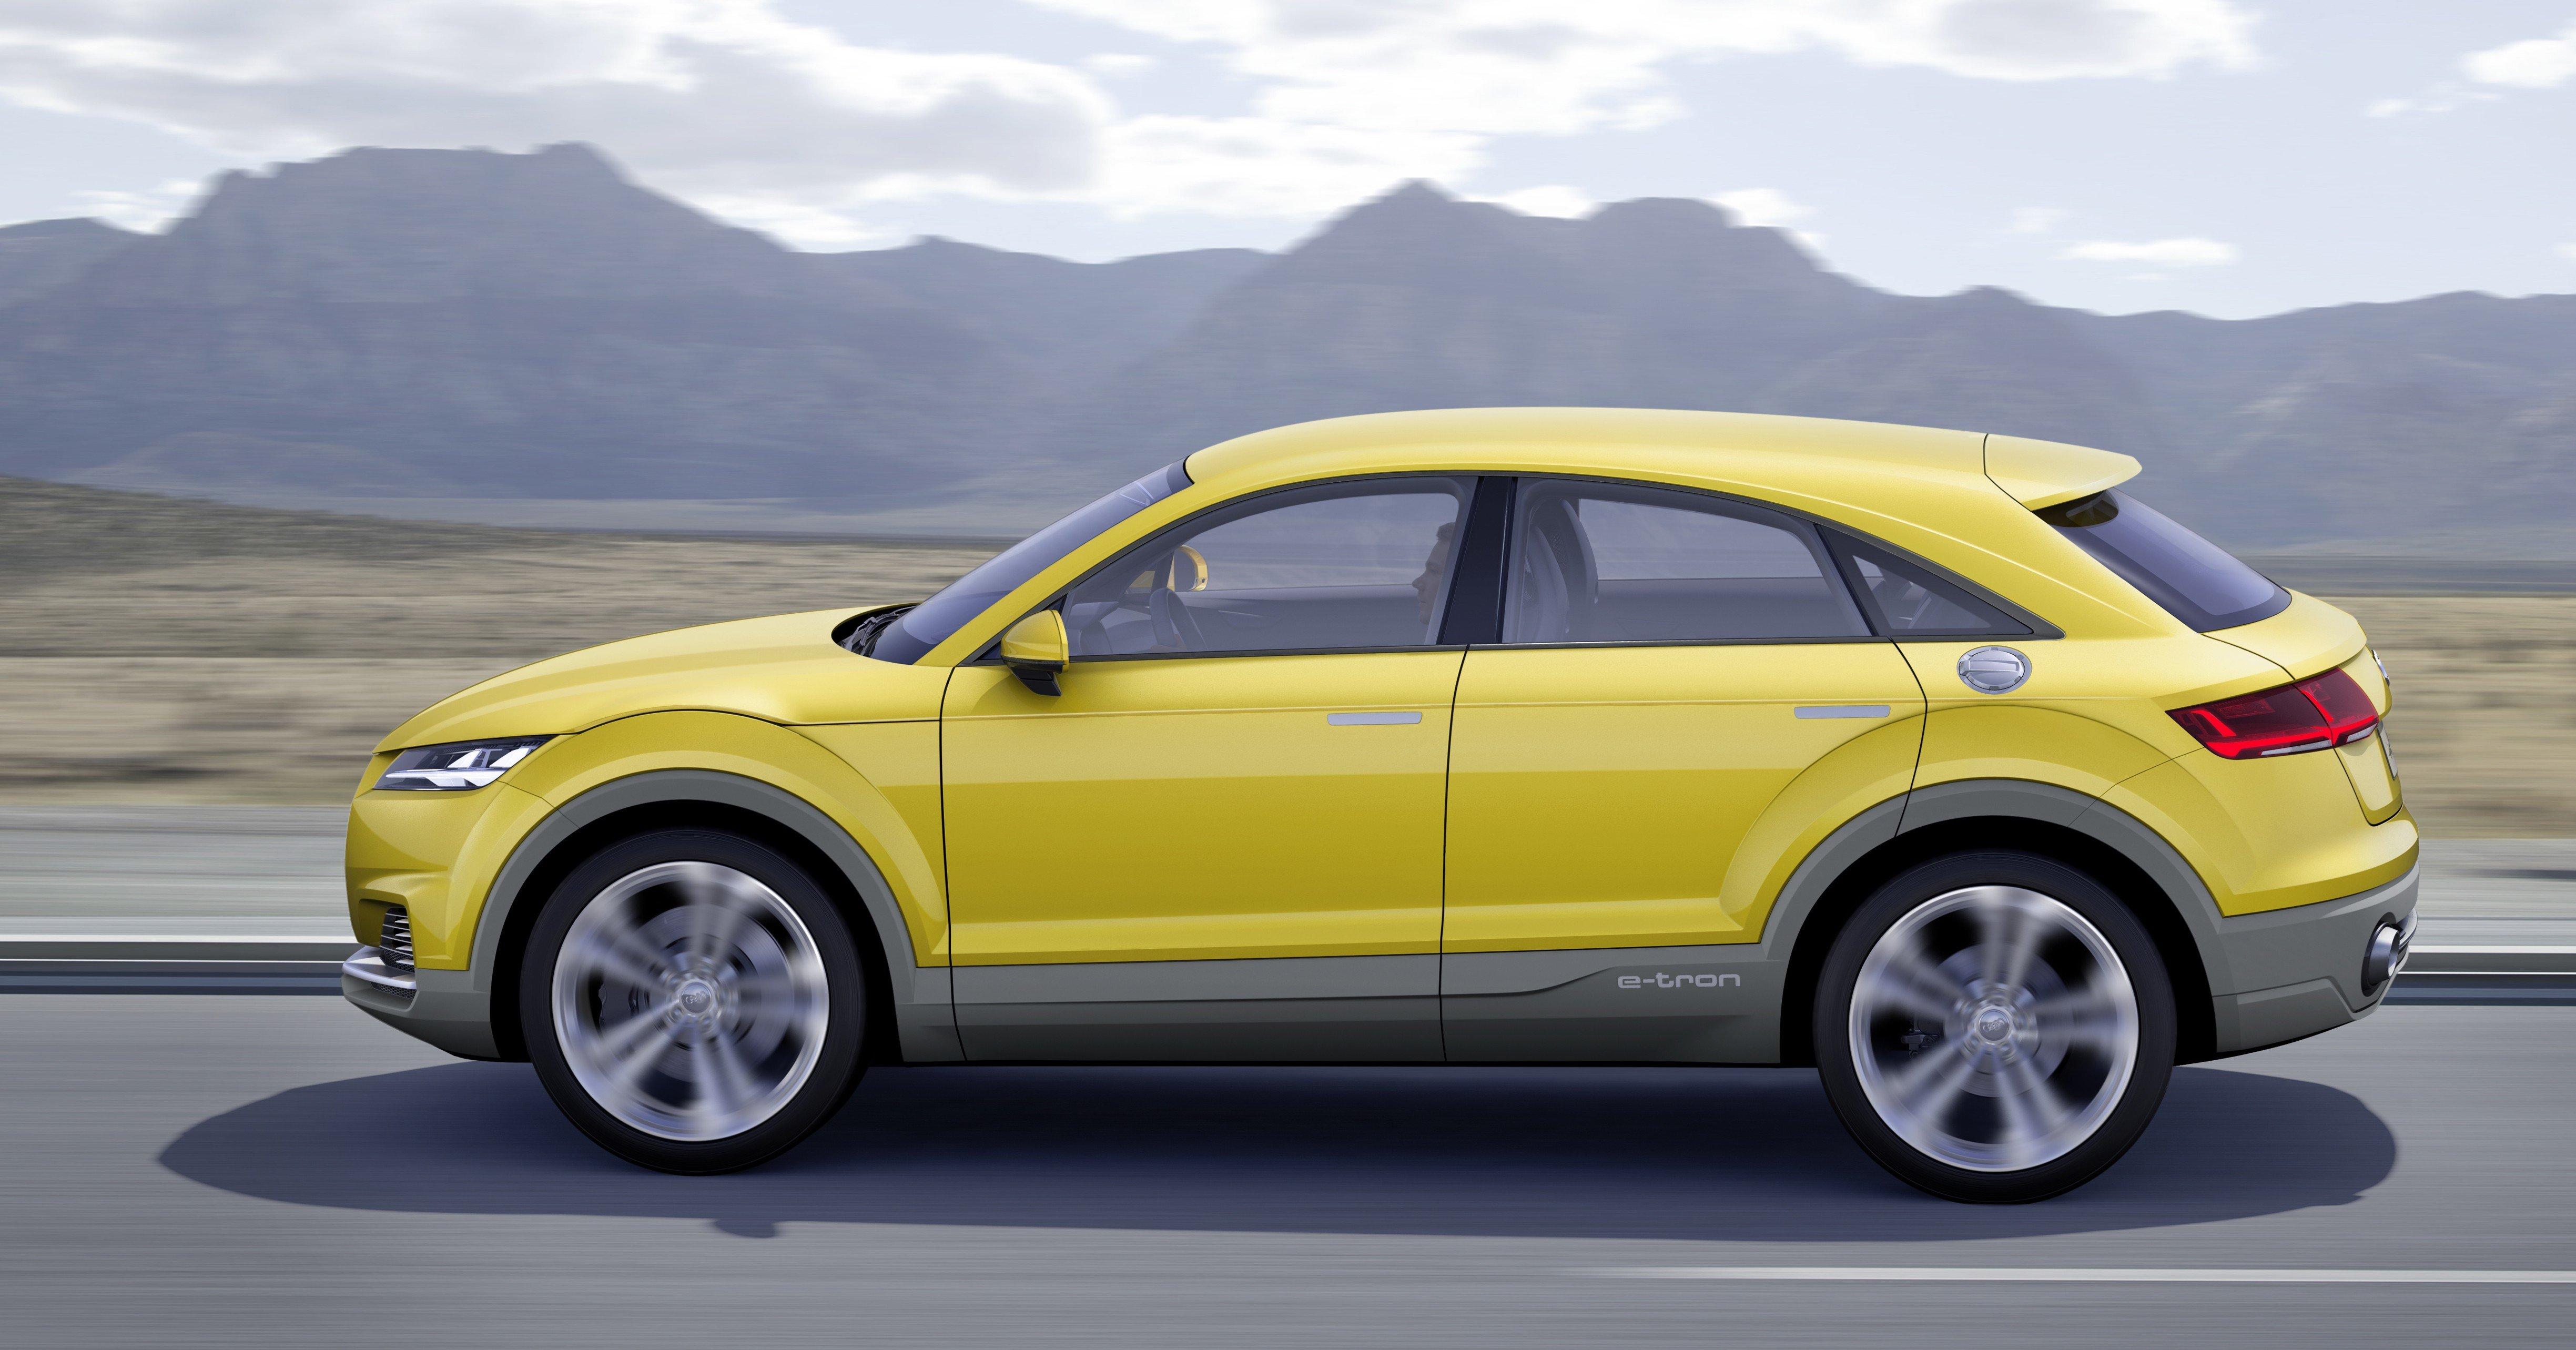 Audi Tt Offroad Concept Previews Future Q4 Tt Suv Image